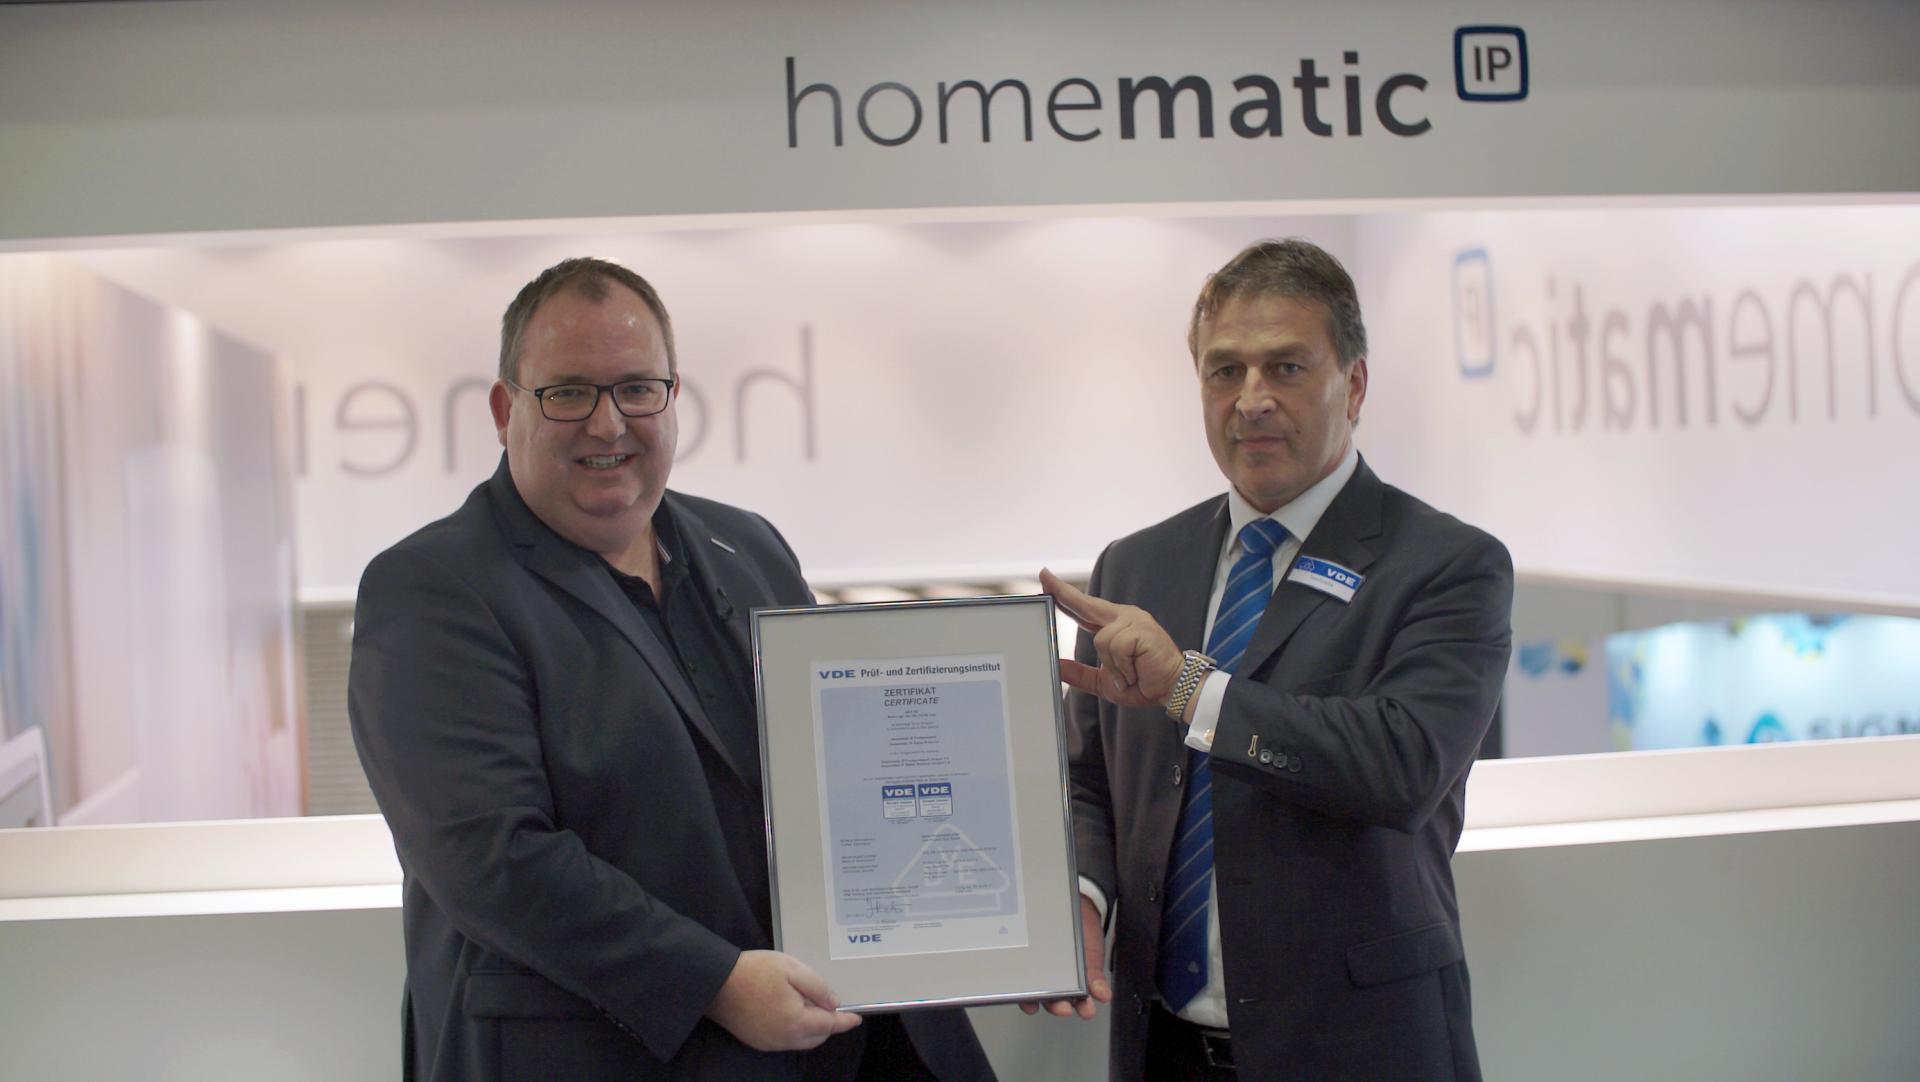 HomeMatic IP -  Als erstes Smart Home System vom VDE zertifiziert